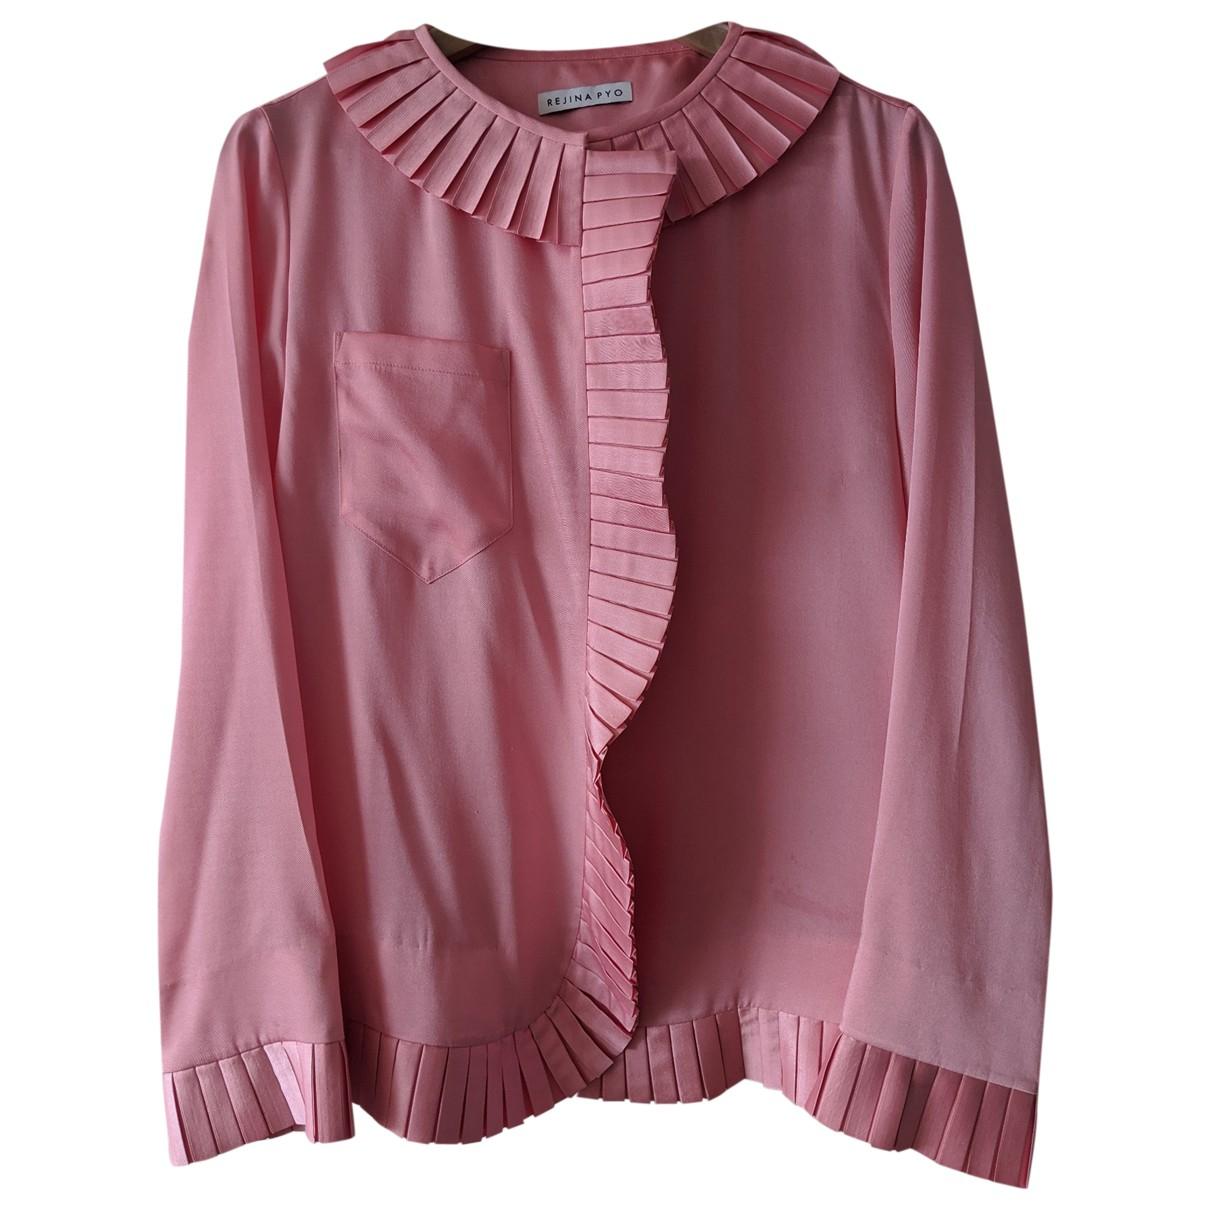 Rejina Pyo \N Pink  top for Women S International